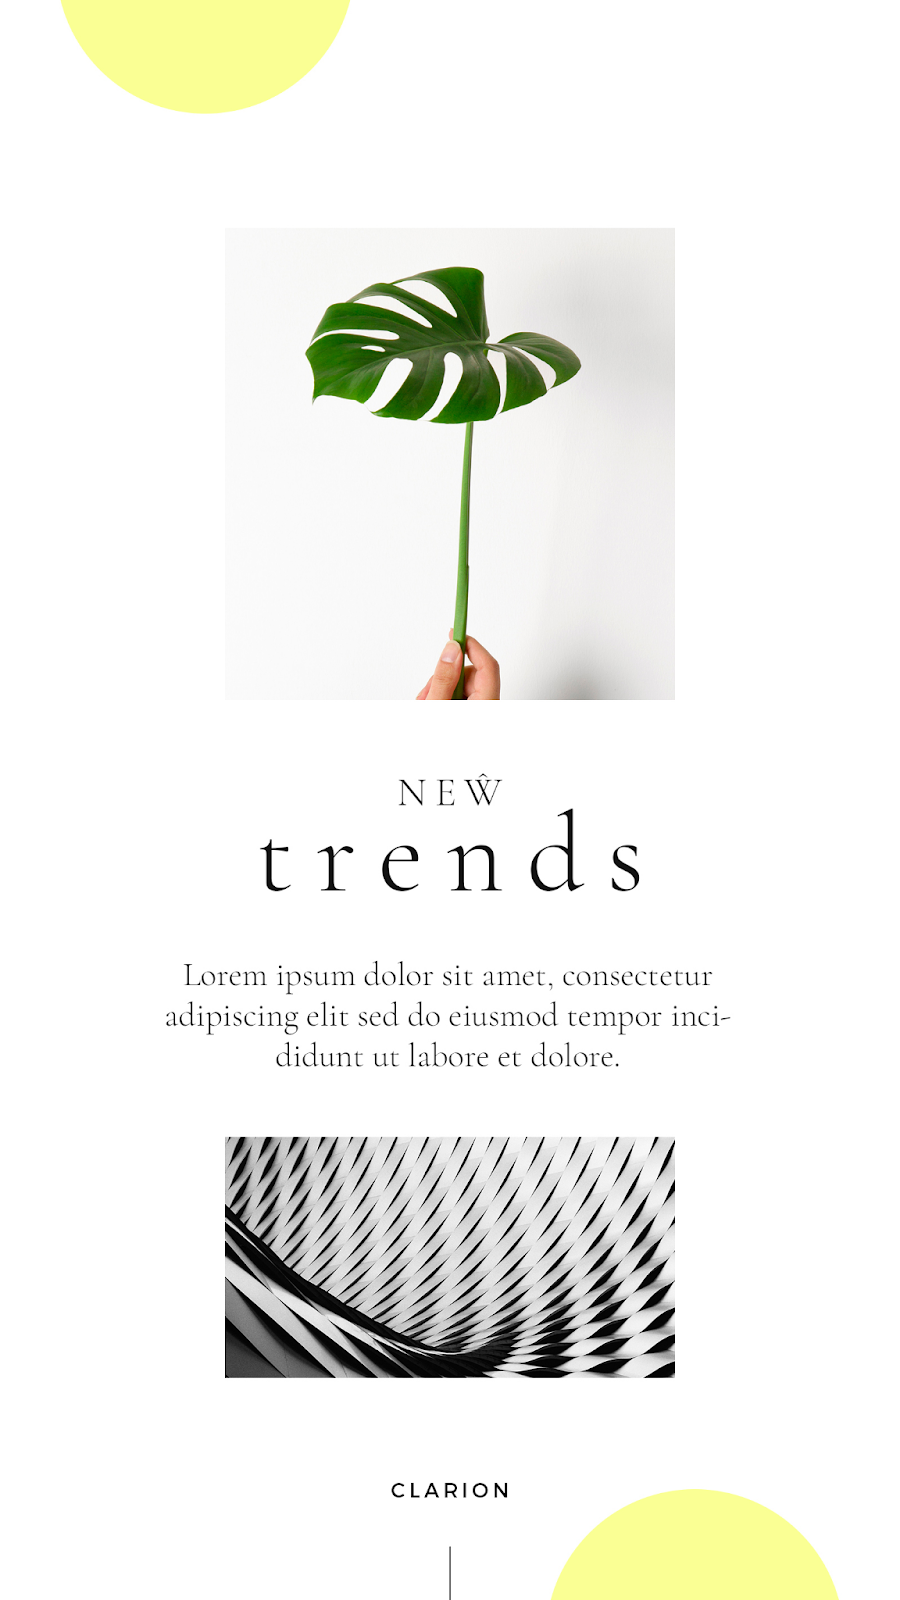 Graphics Eggs New Trends Instagram Stories Templates